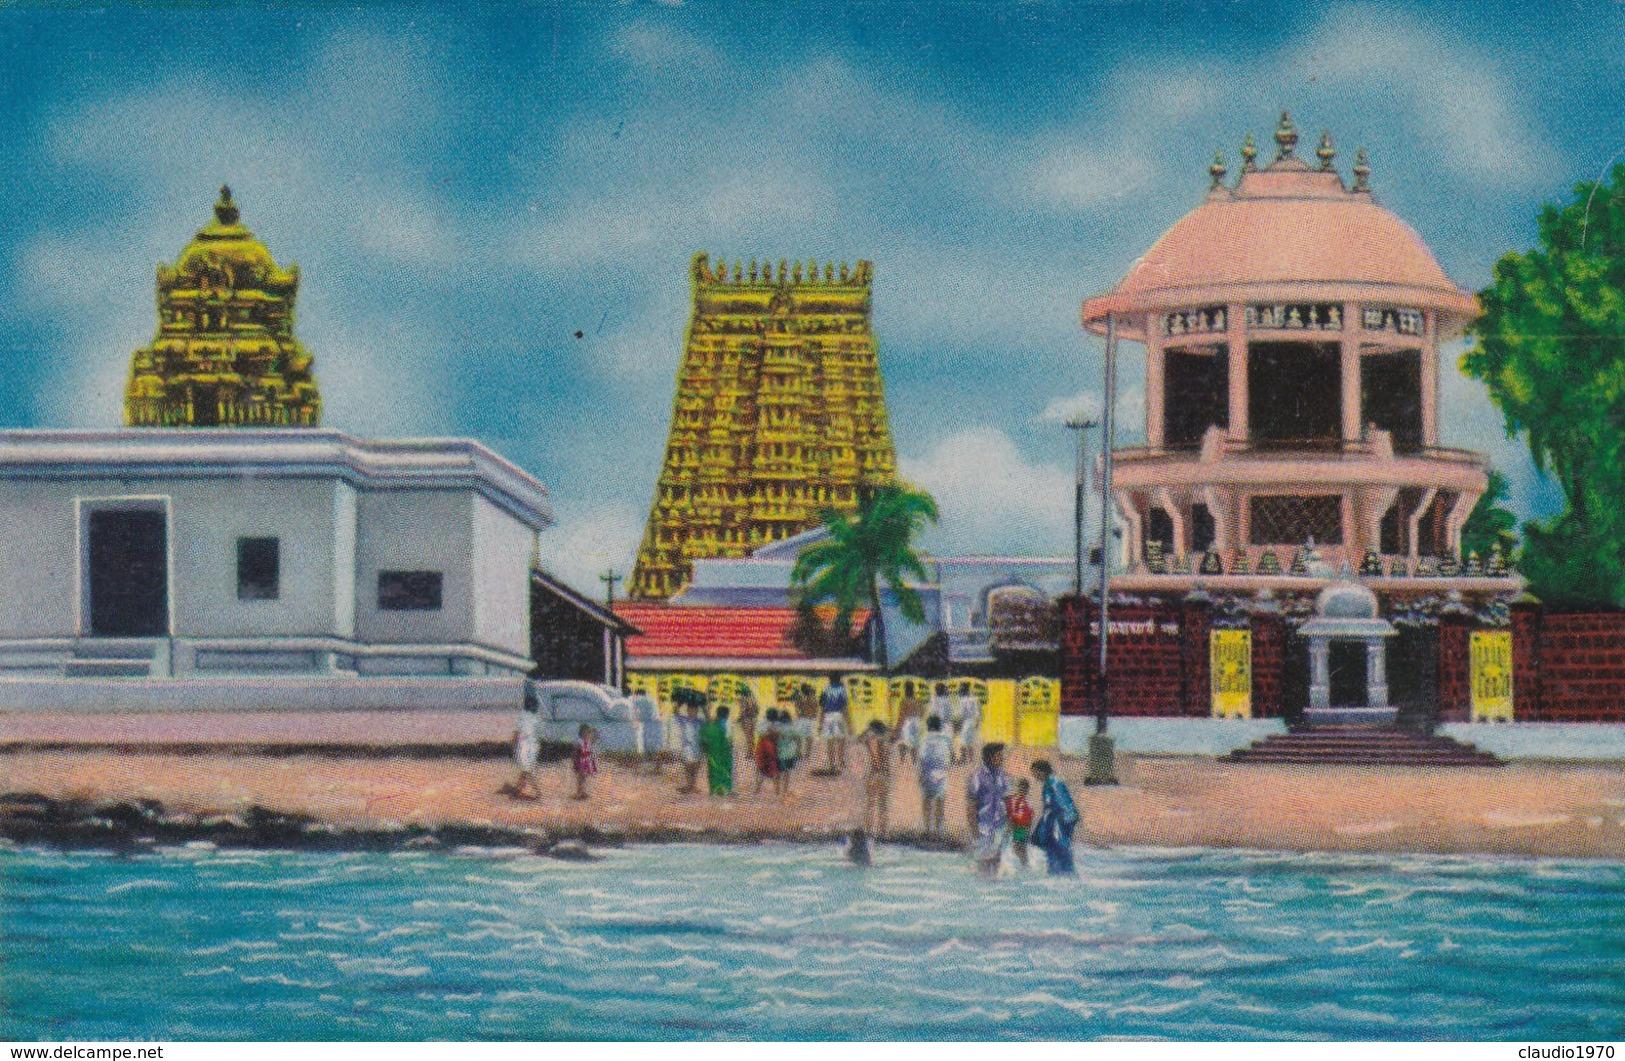 CARTOLINA - POSTCARD - INDIA - SRI SANKAR MUTT AND AGNITHEERTHAM - India